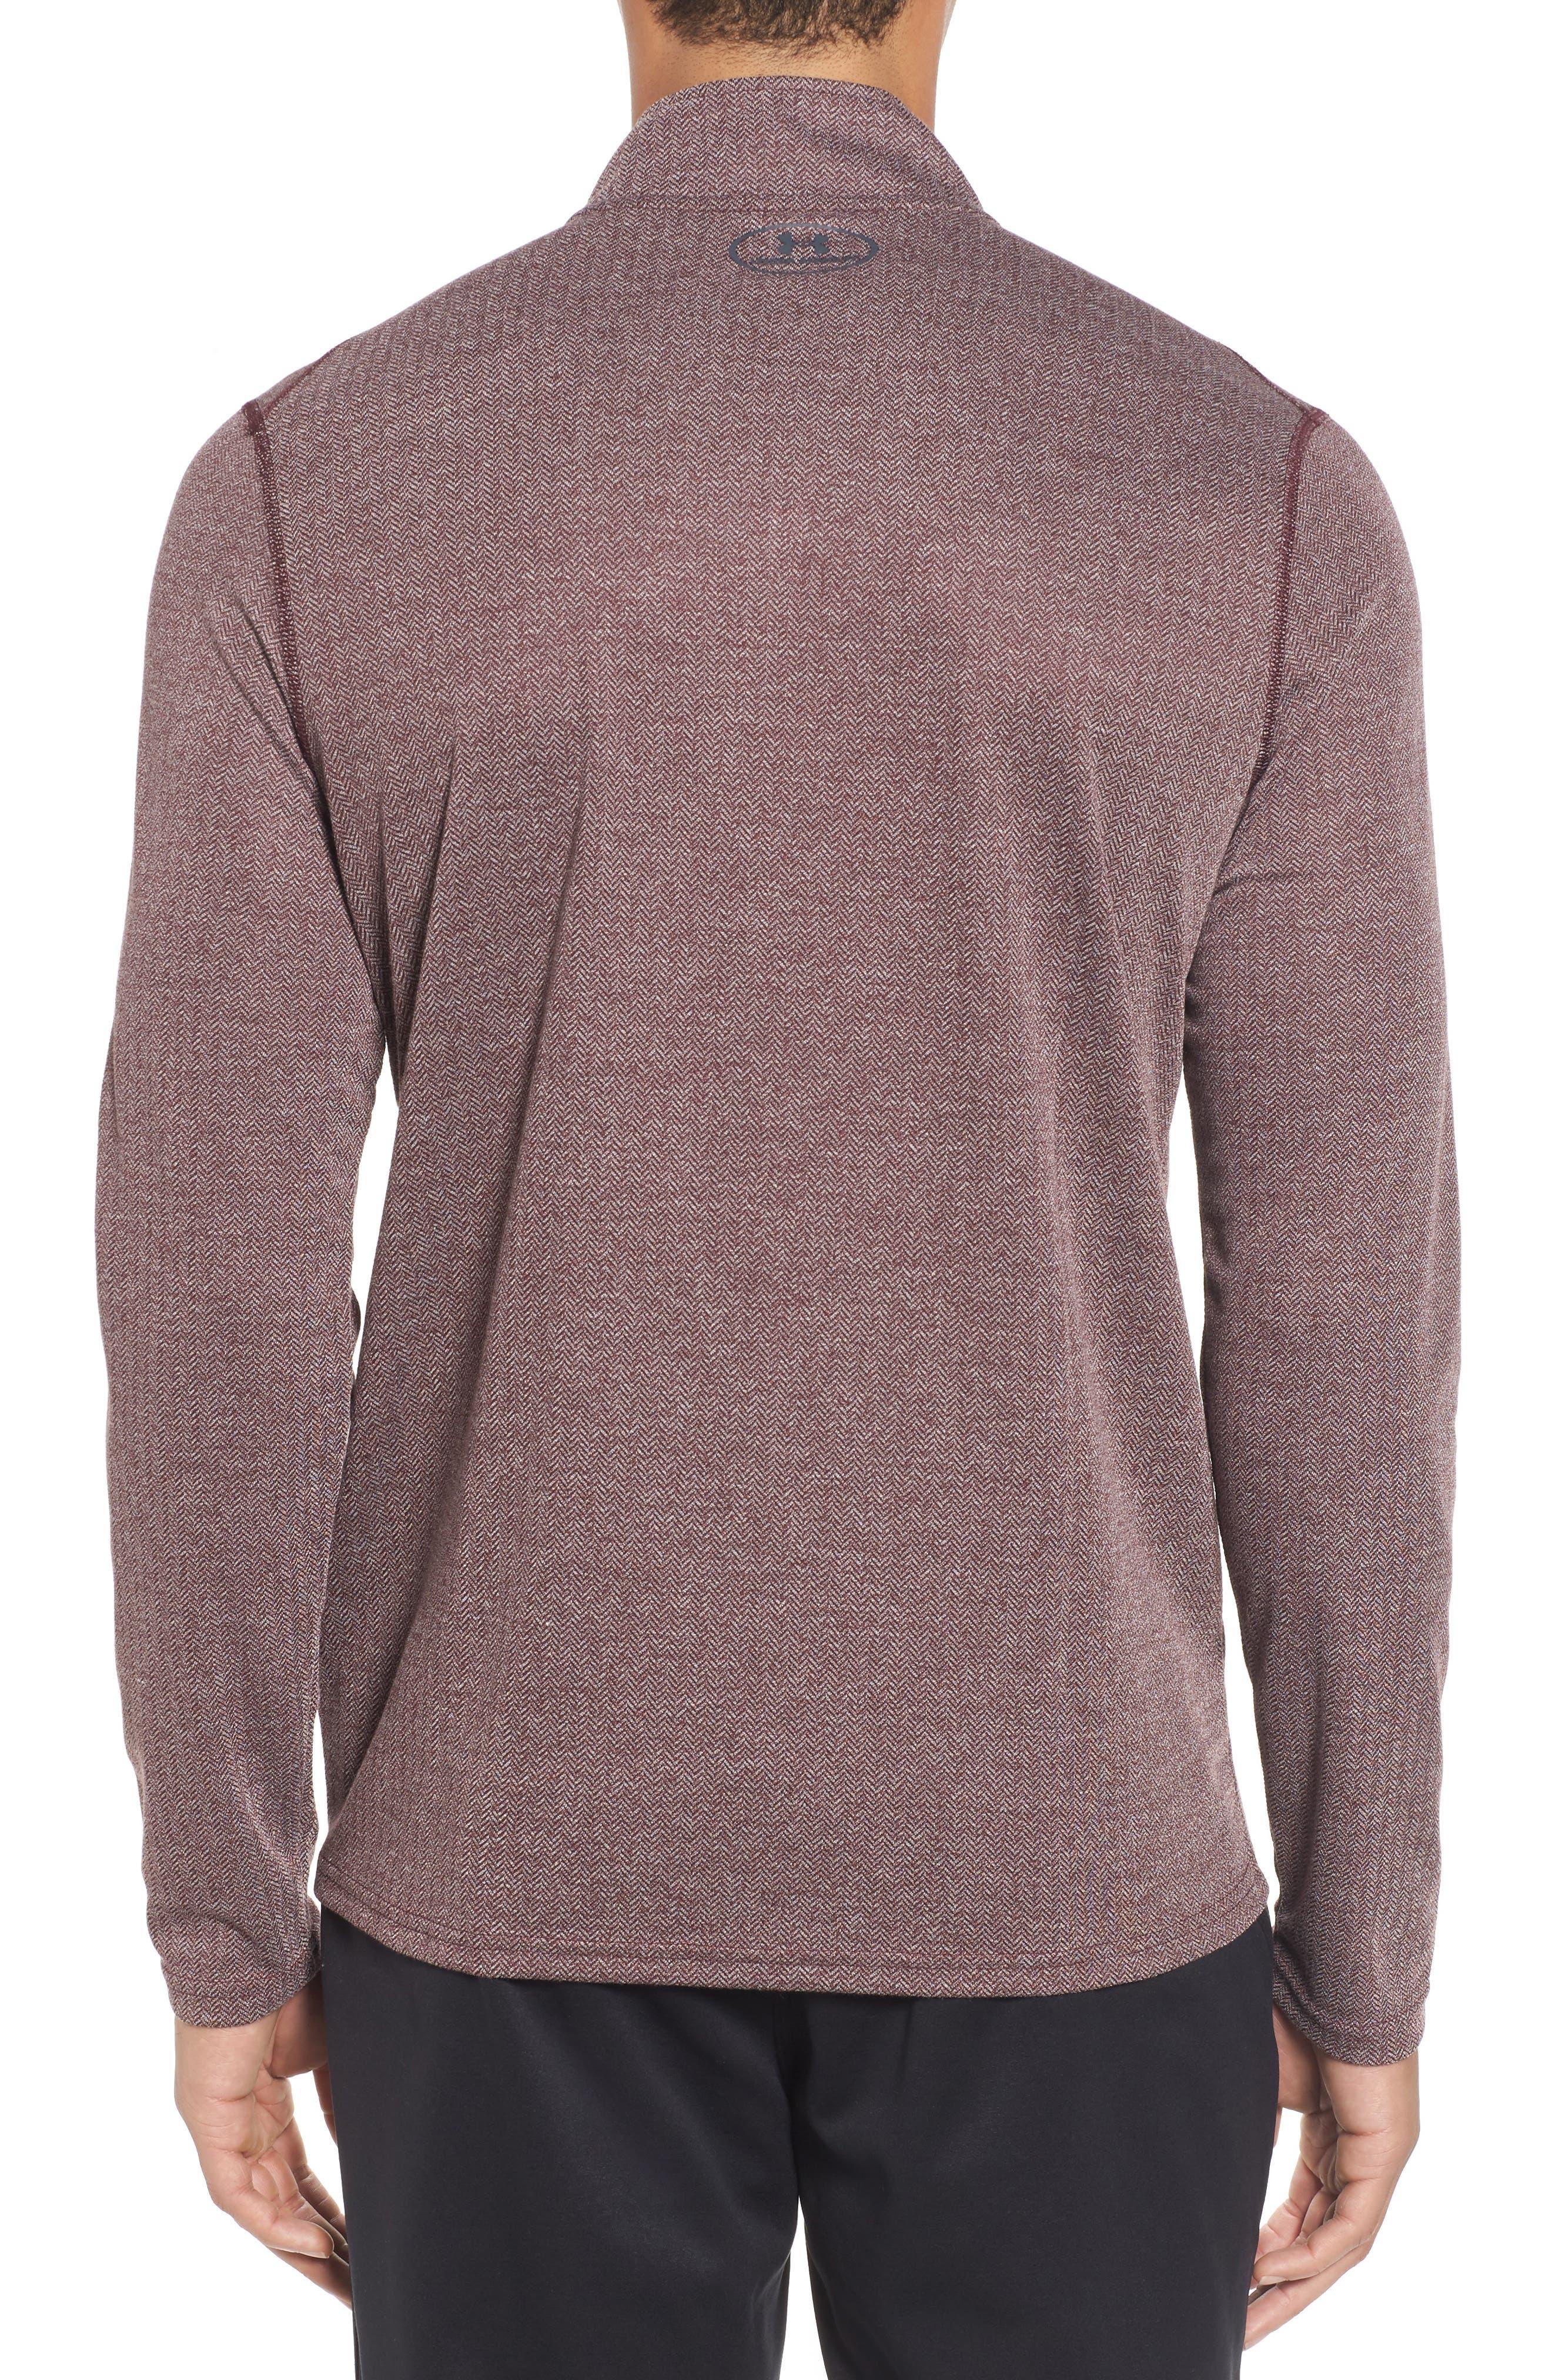 Alternate Image 2  - Under Armour Threadborne Quarter-Zip Performance Shirt